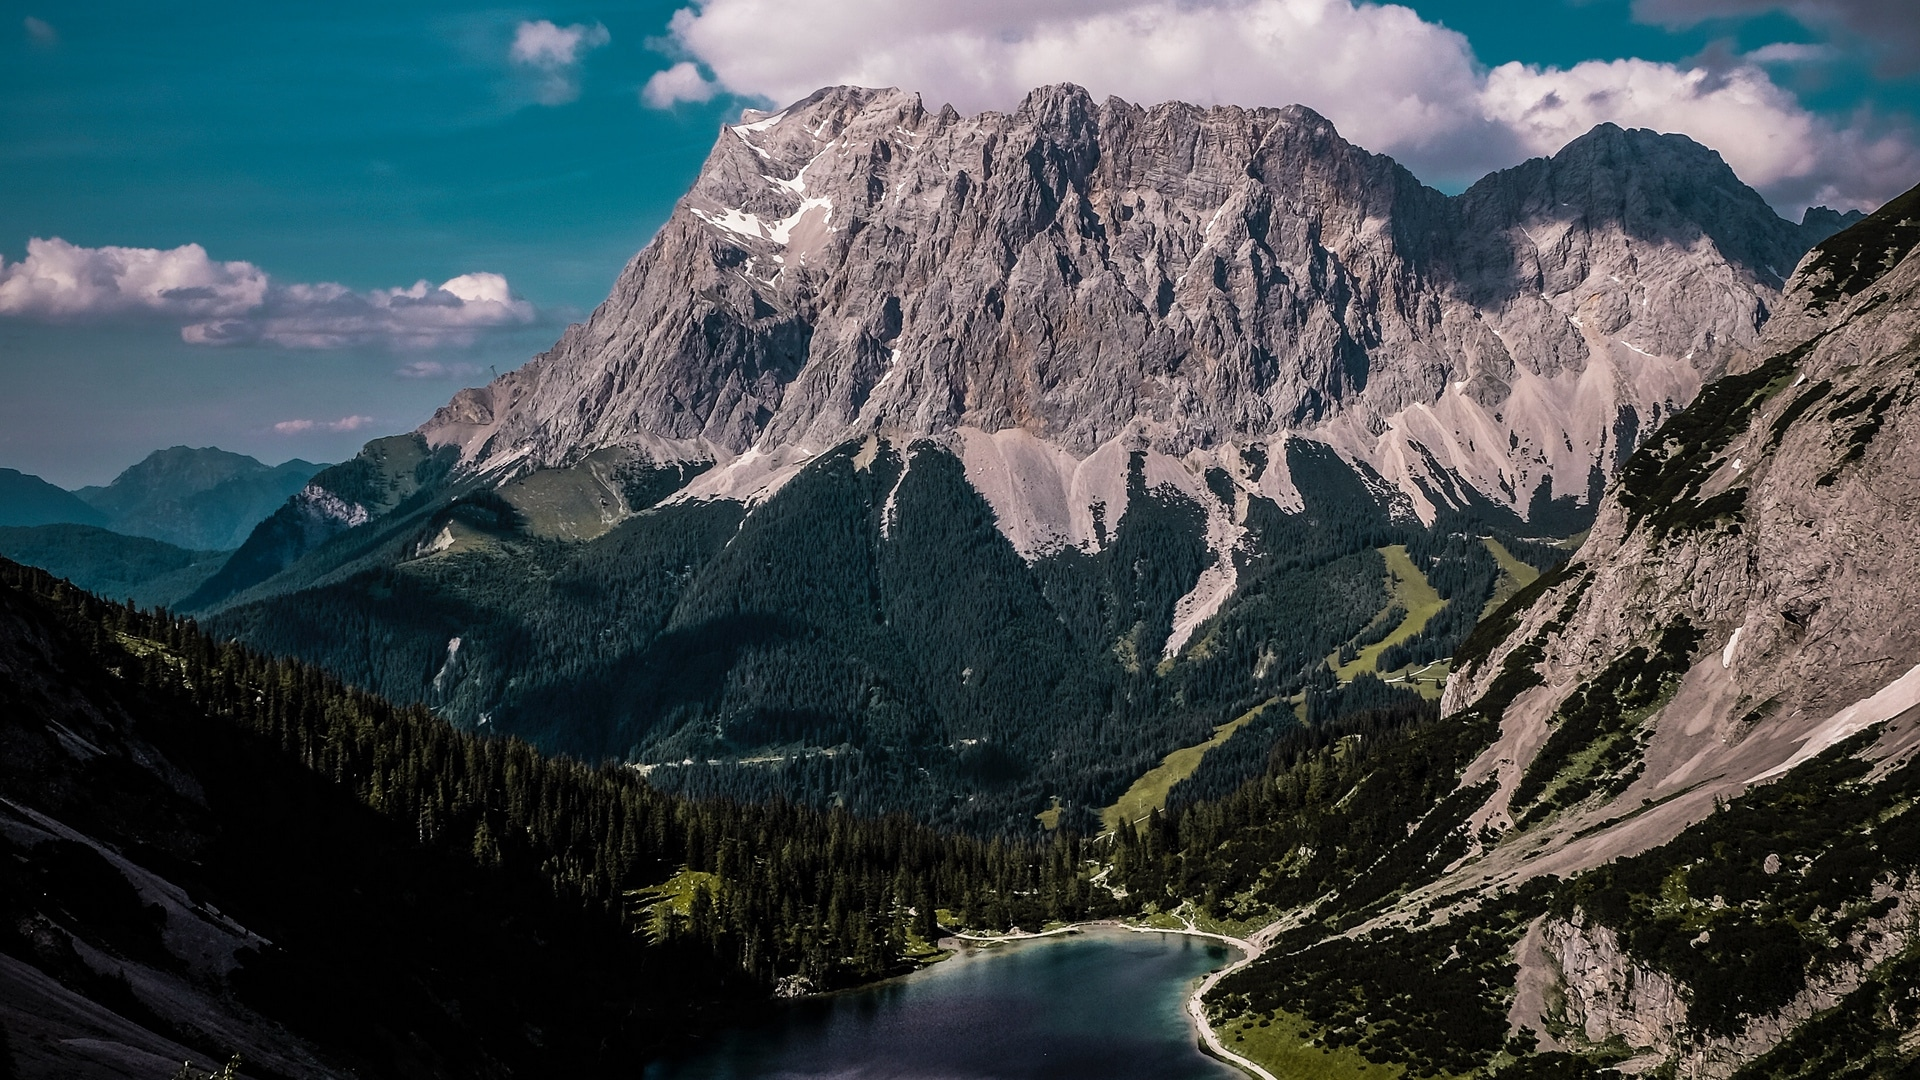 mountains_lake_clouds_123185_1920x1080